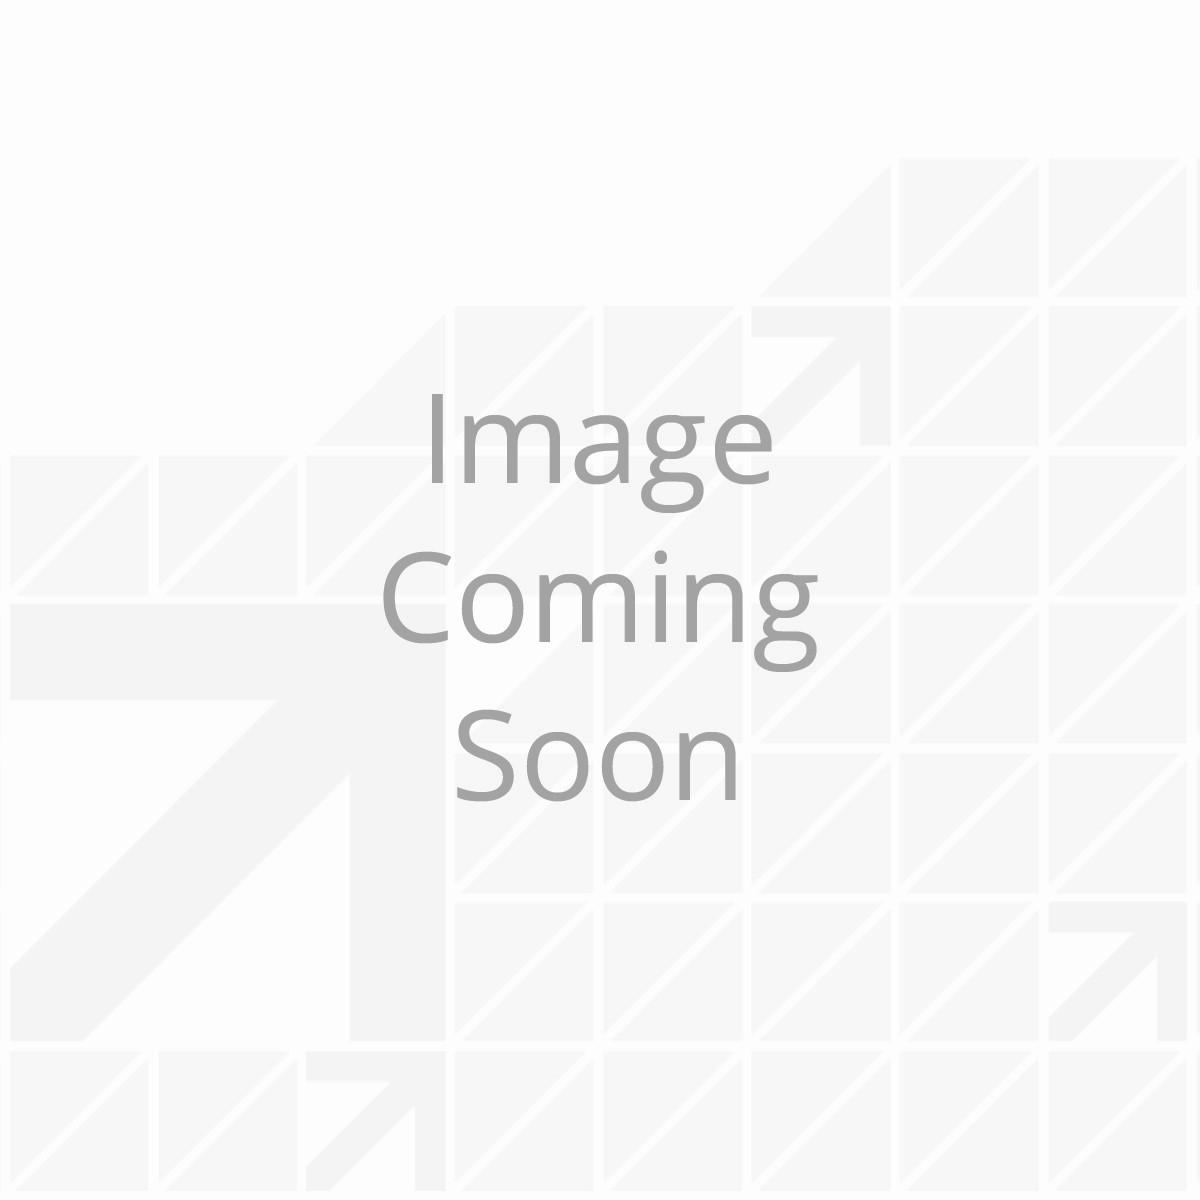 Hydraulic Hose End Fitting (JIC) - Crimp-on Coupling